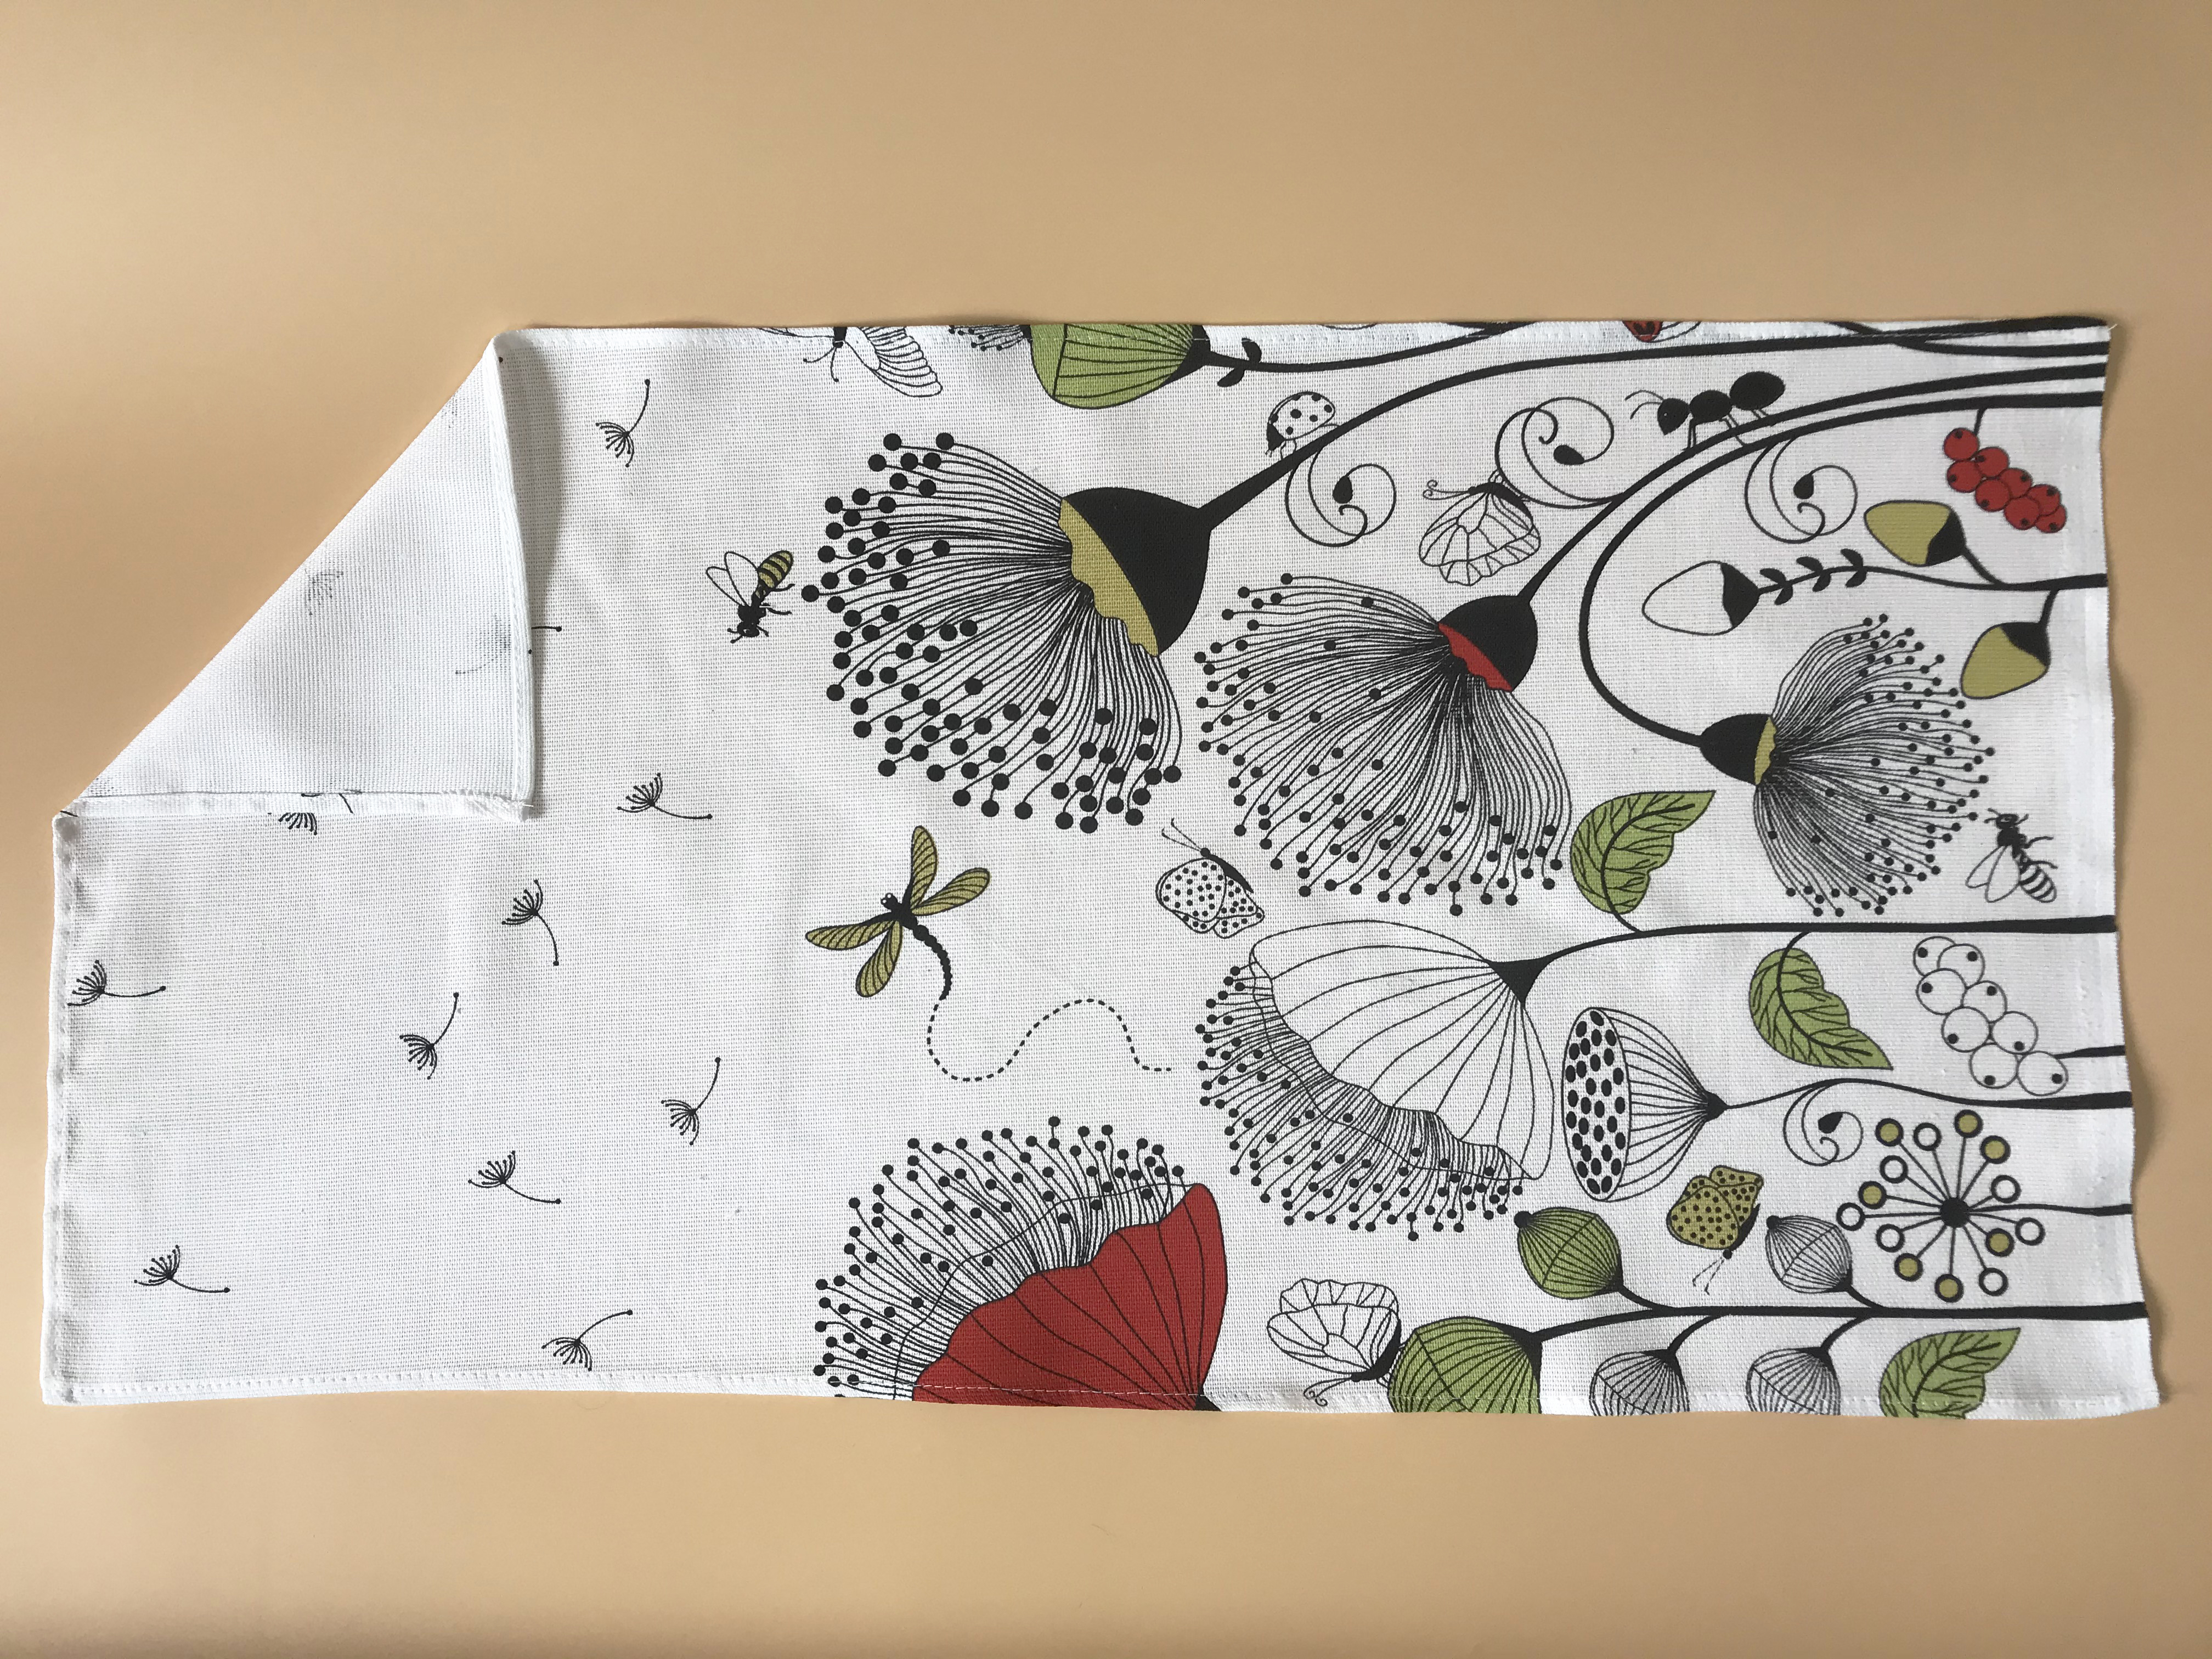 Kitchen Towel cotton 100% with Dandelions Print. Cotton Rich Linen. Gift for